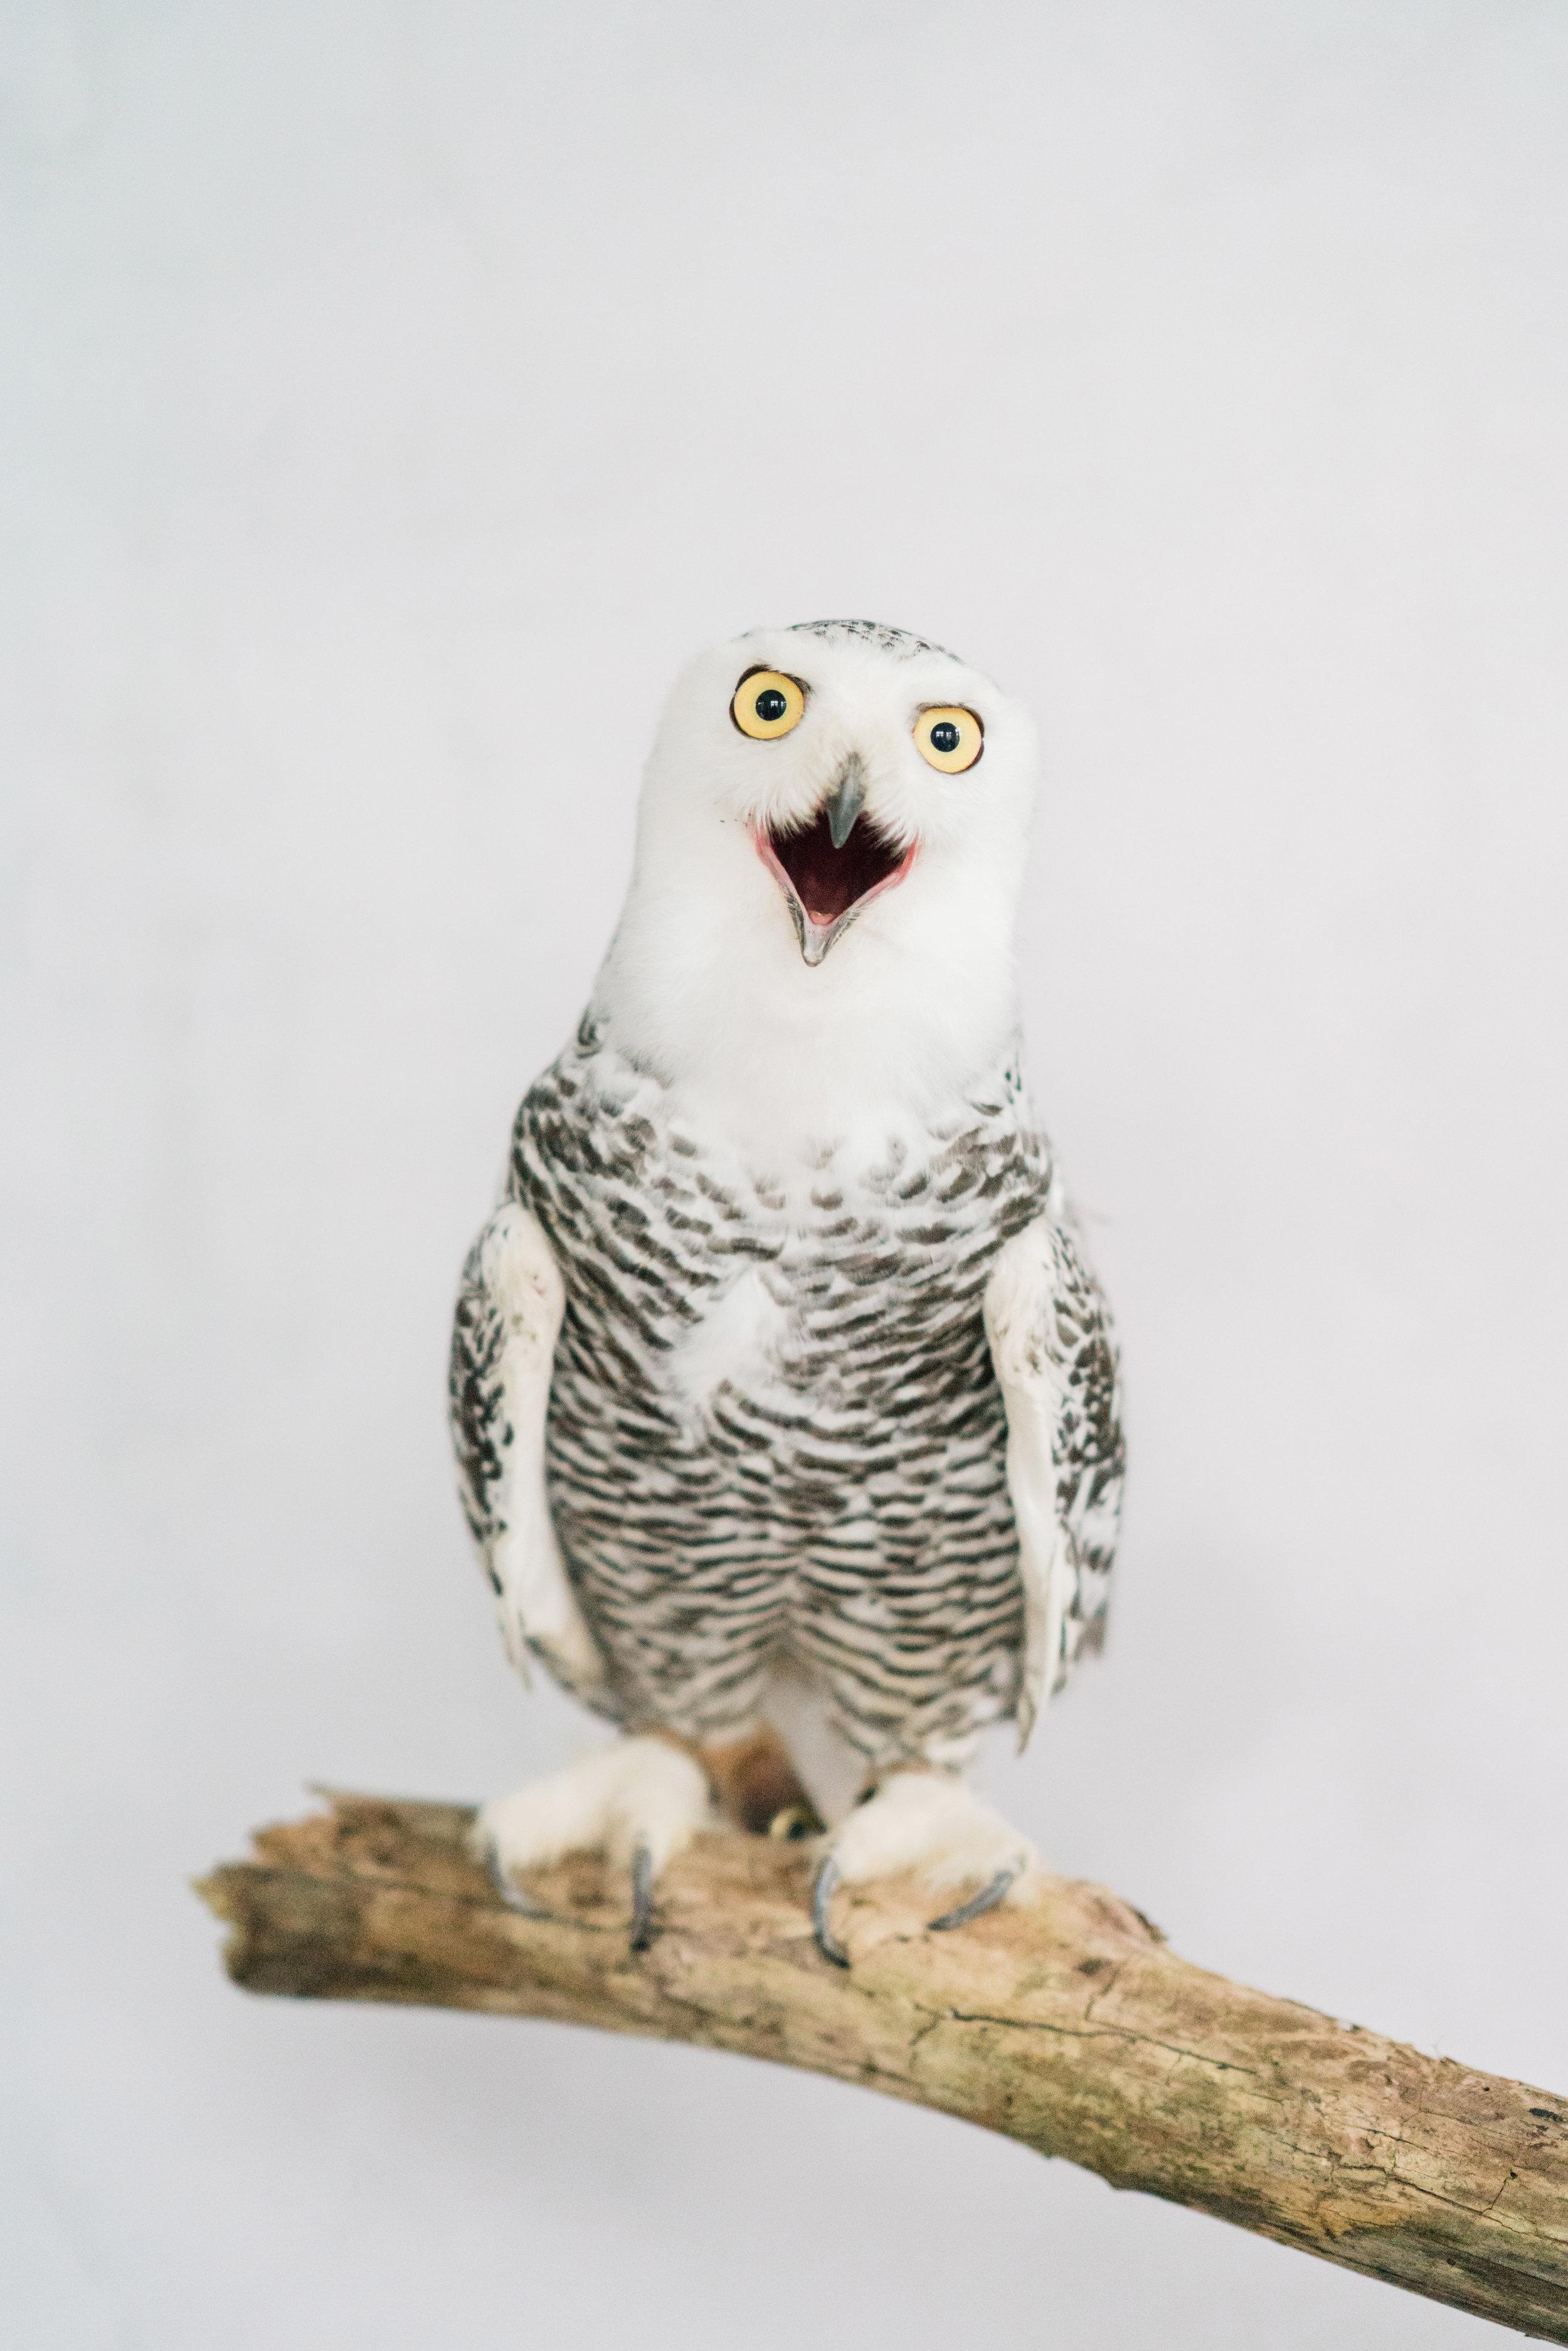 August In Bloom - Owl - Serene Dream (Wedluxe)